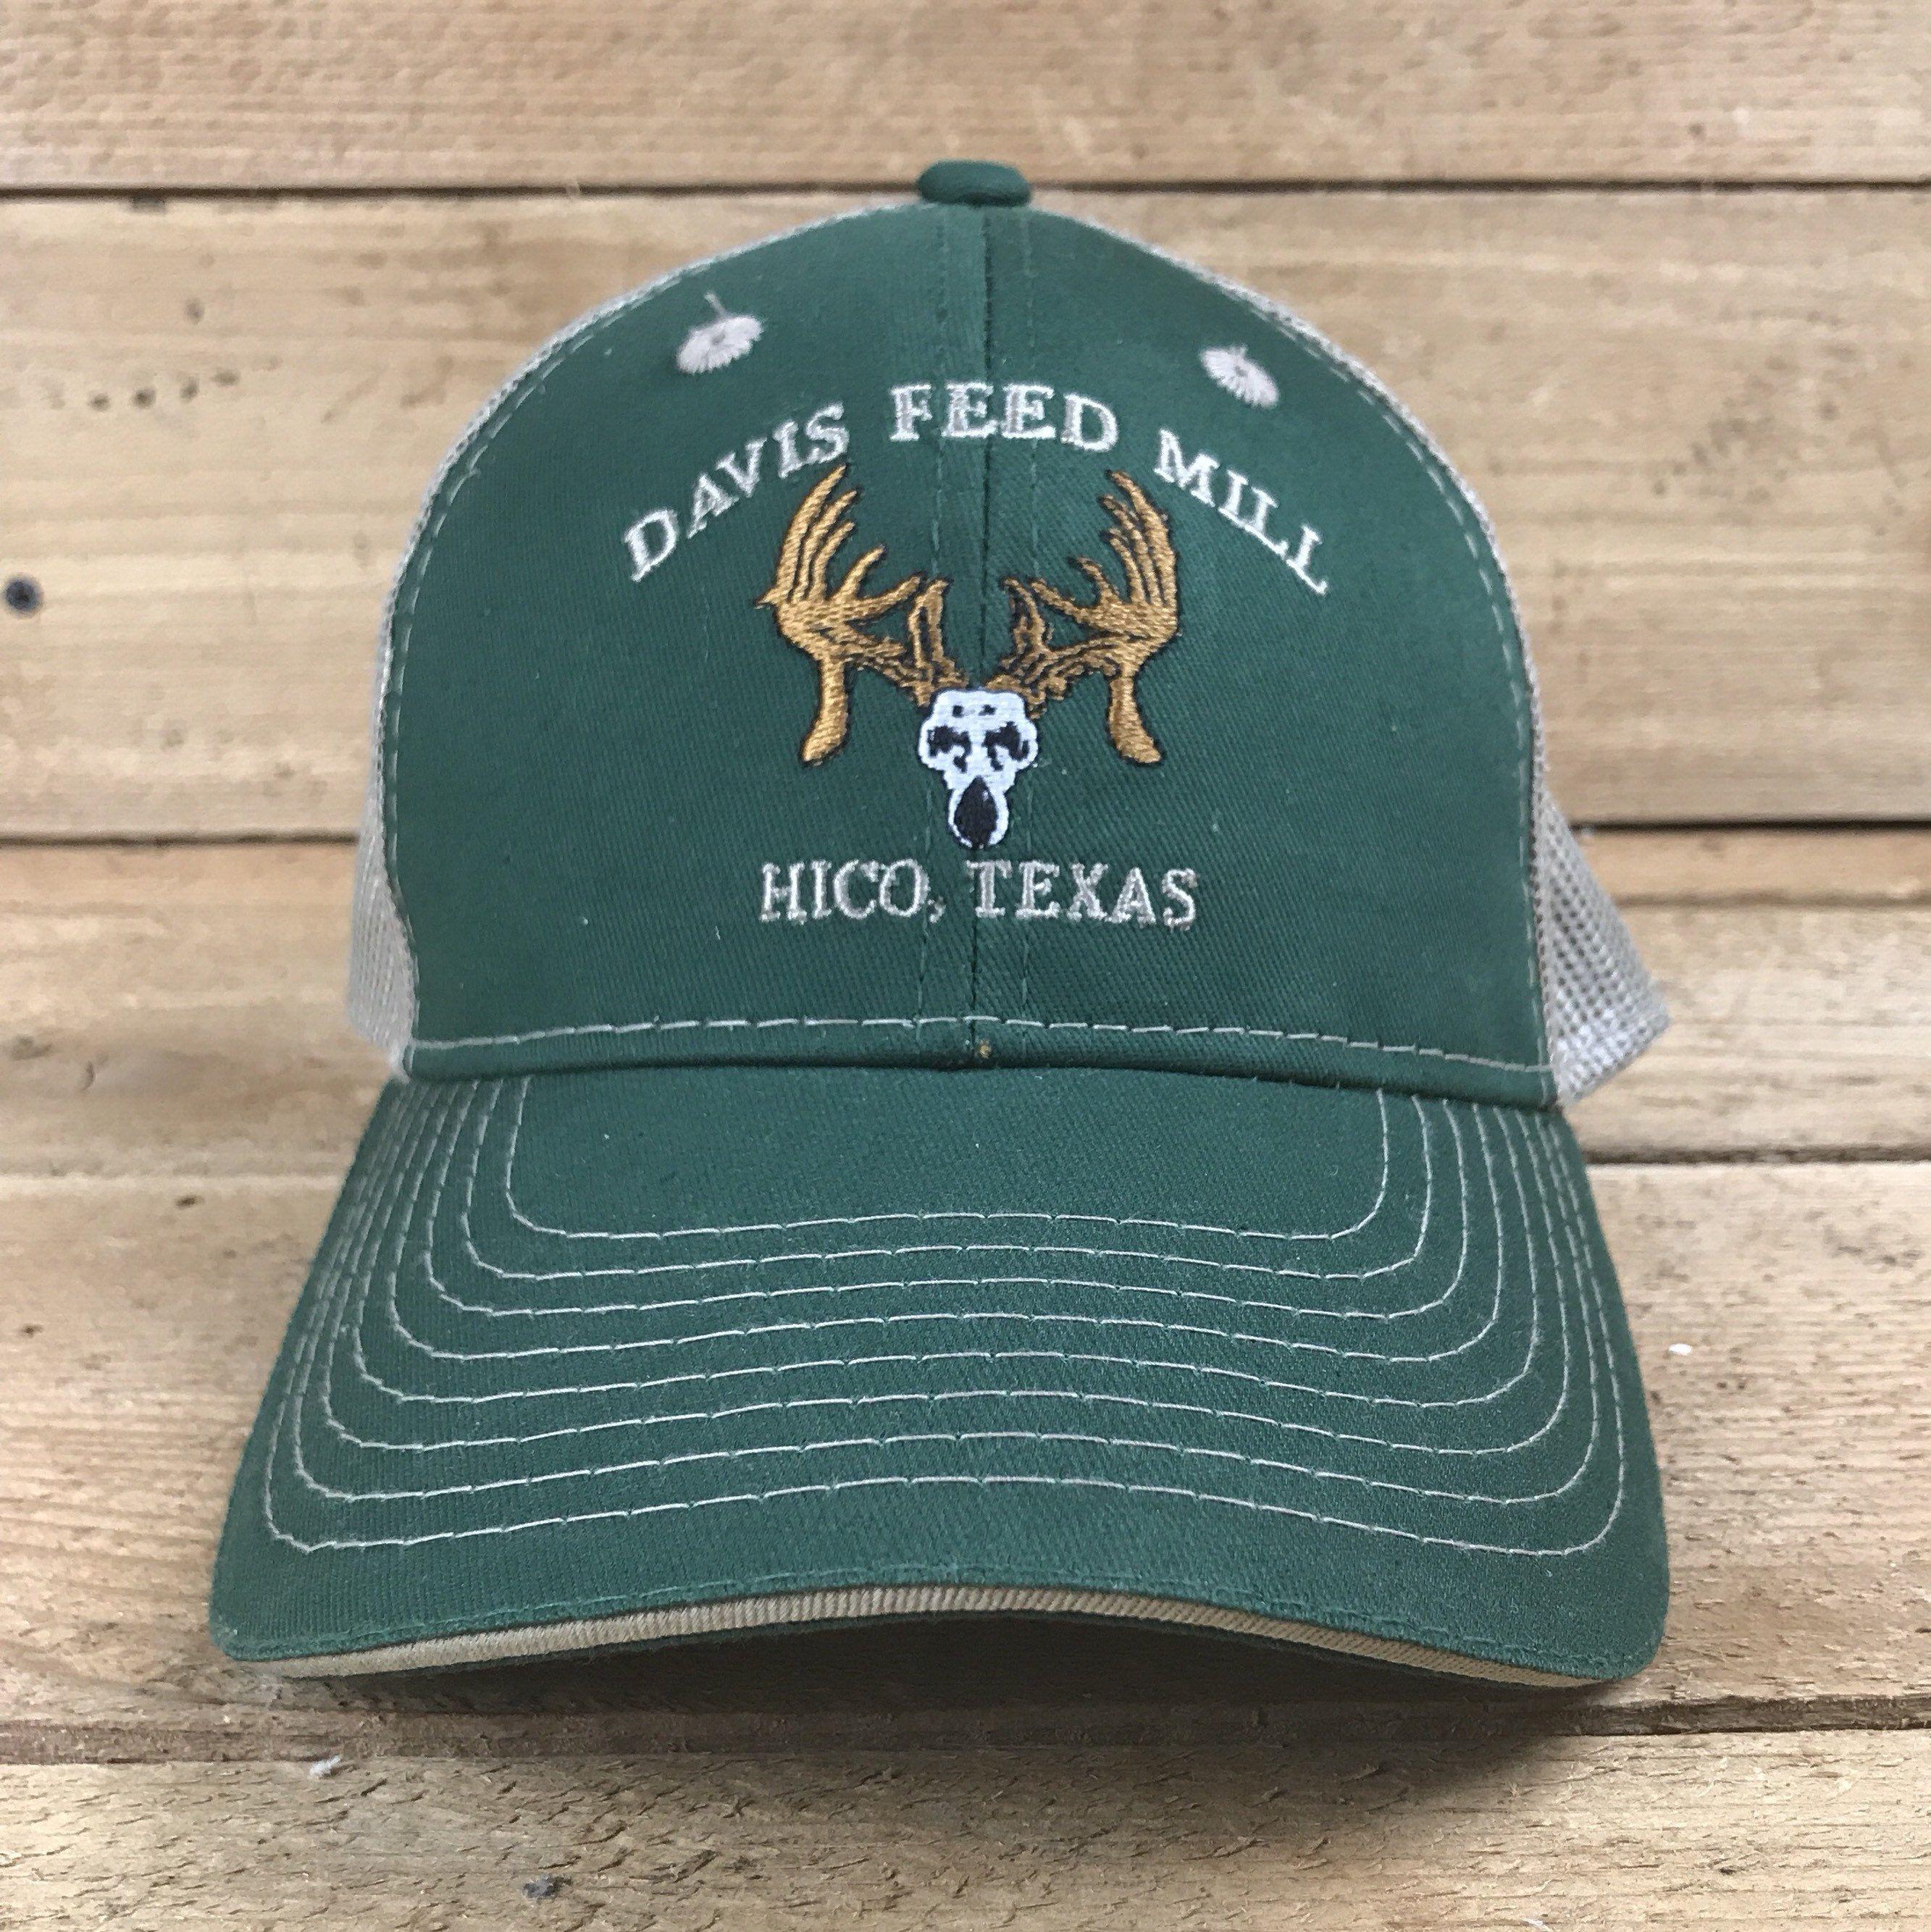 Hat Shapes Cowboy Hats Hats For Men Hats